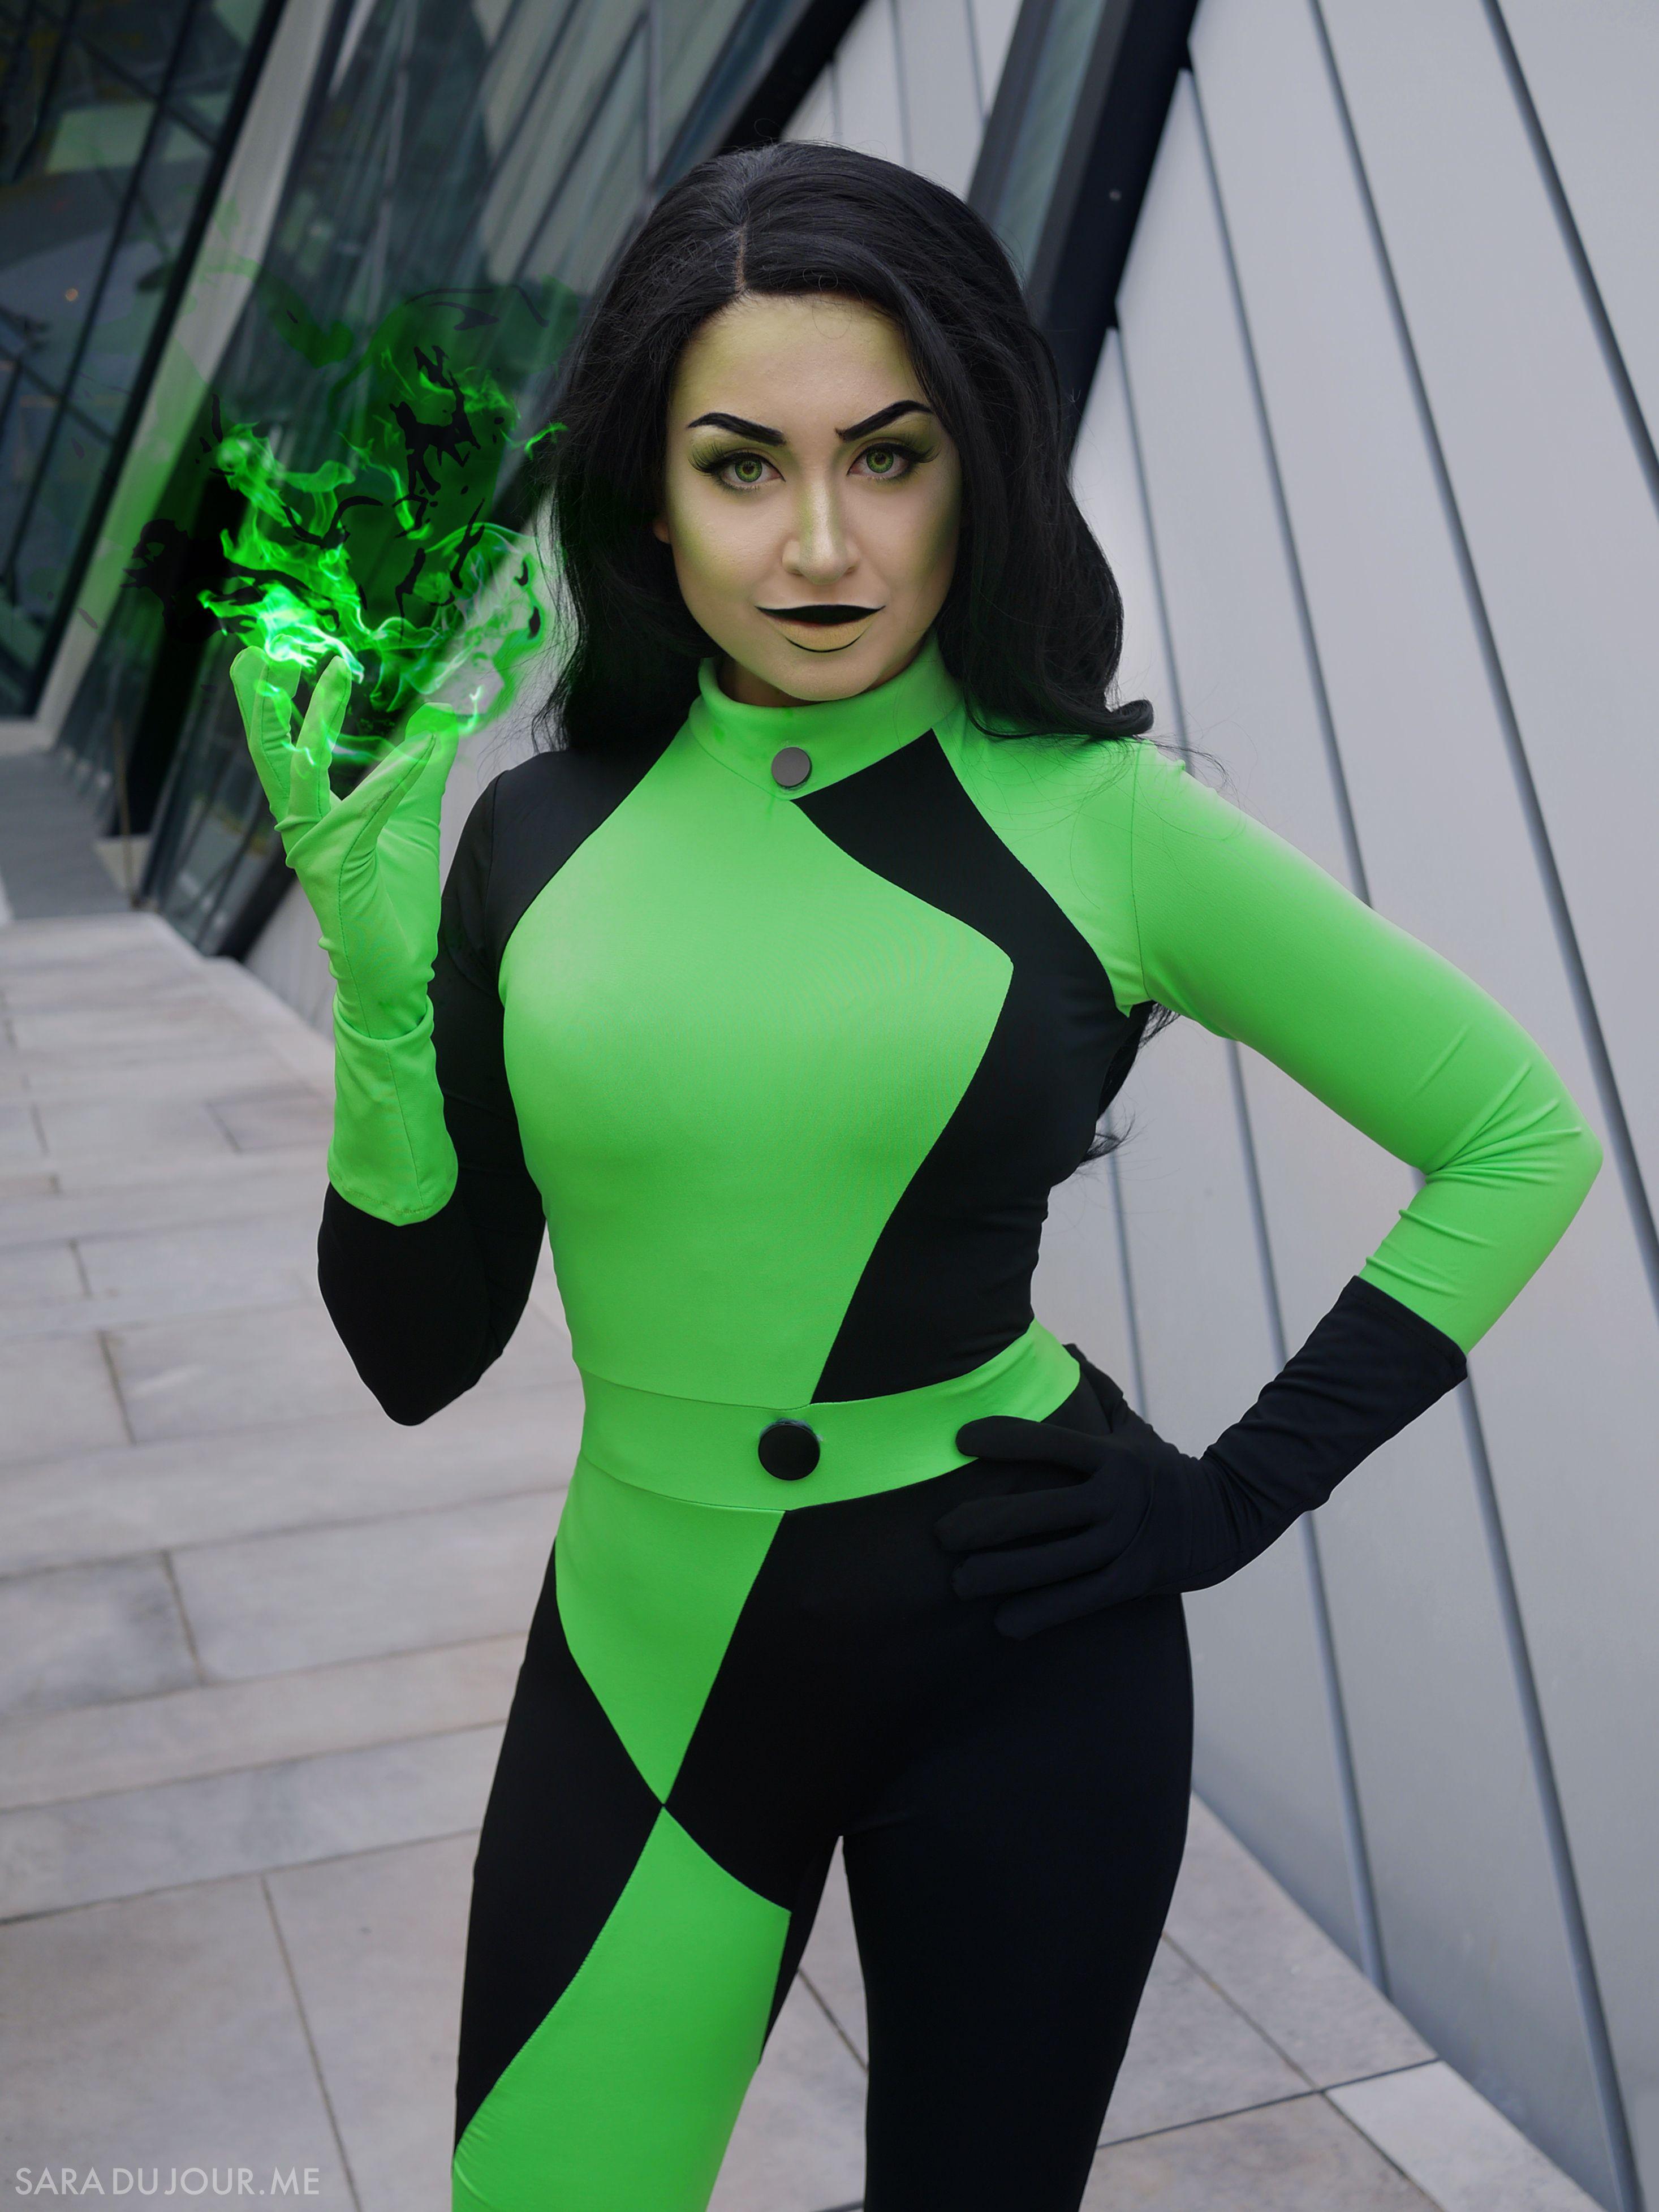 Halloween 2020 Jour Shego Cosplay + Costume   Kim Possible   Sara du Jour in 2020